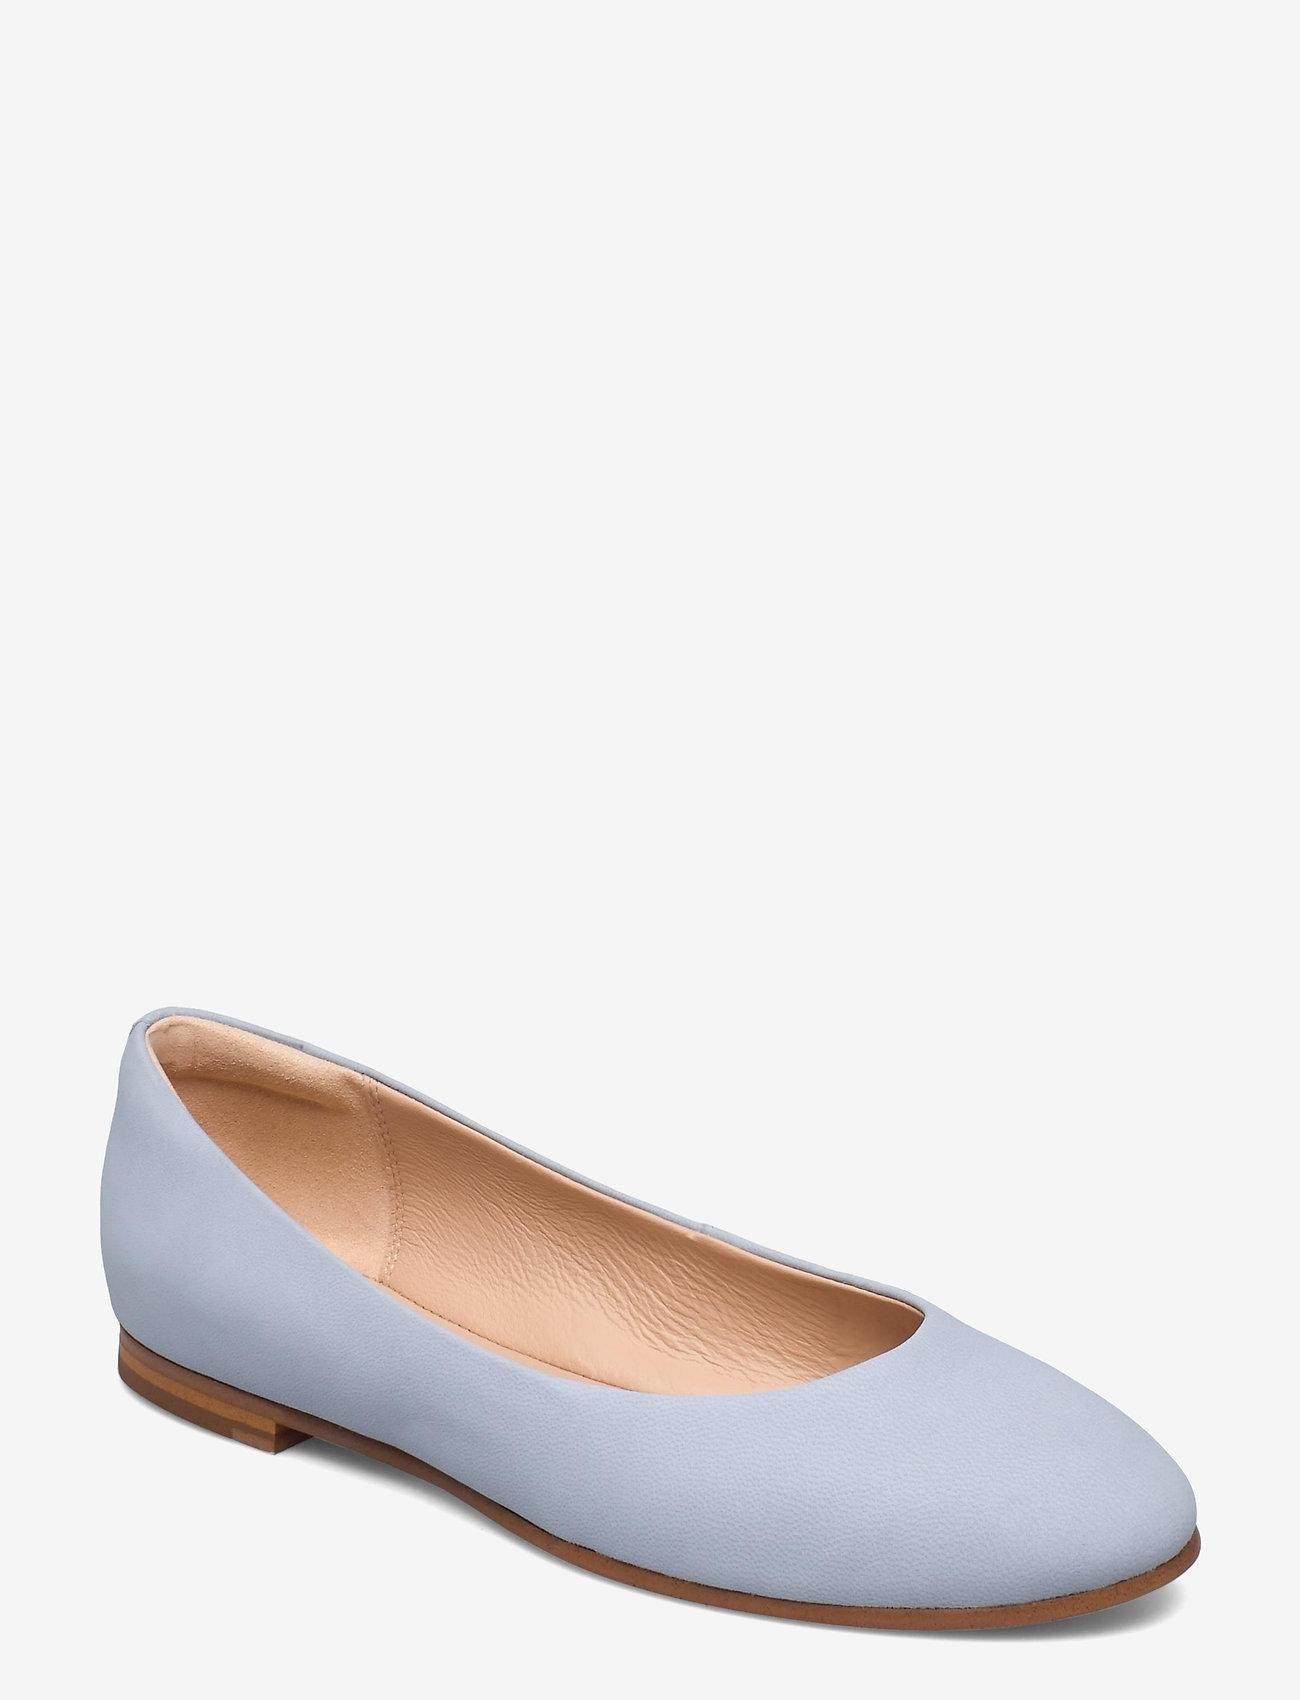 Clarks - Grace Piper - ballerinas - pale blue - 0